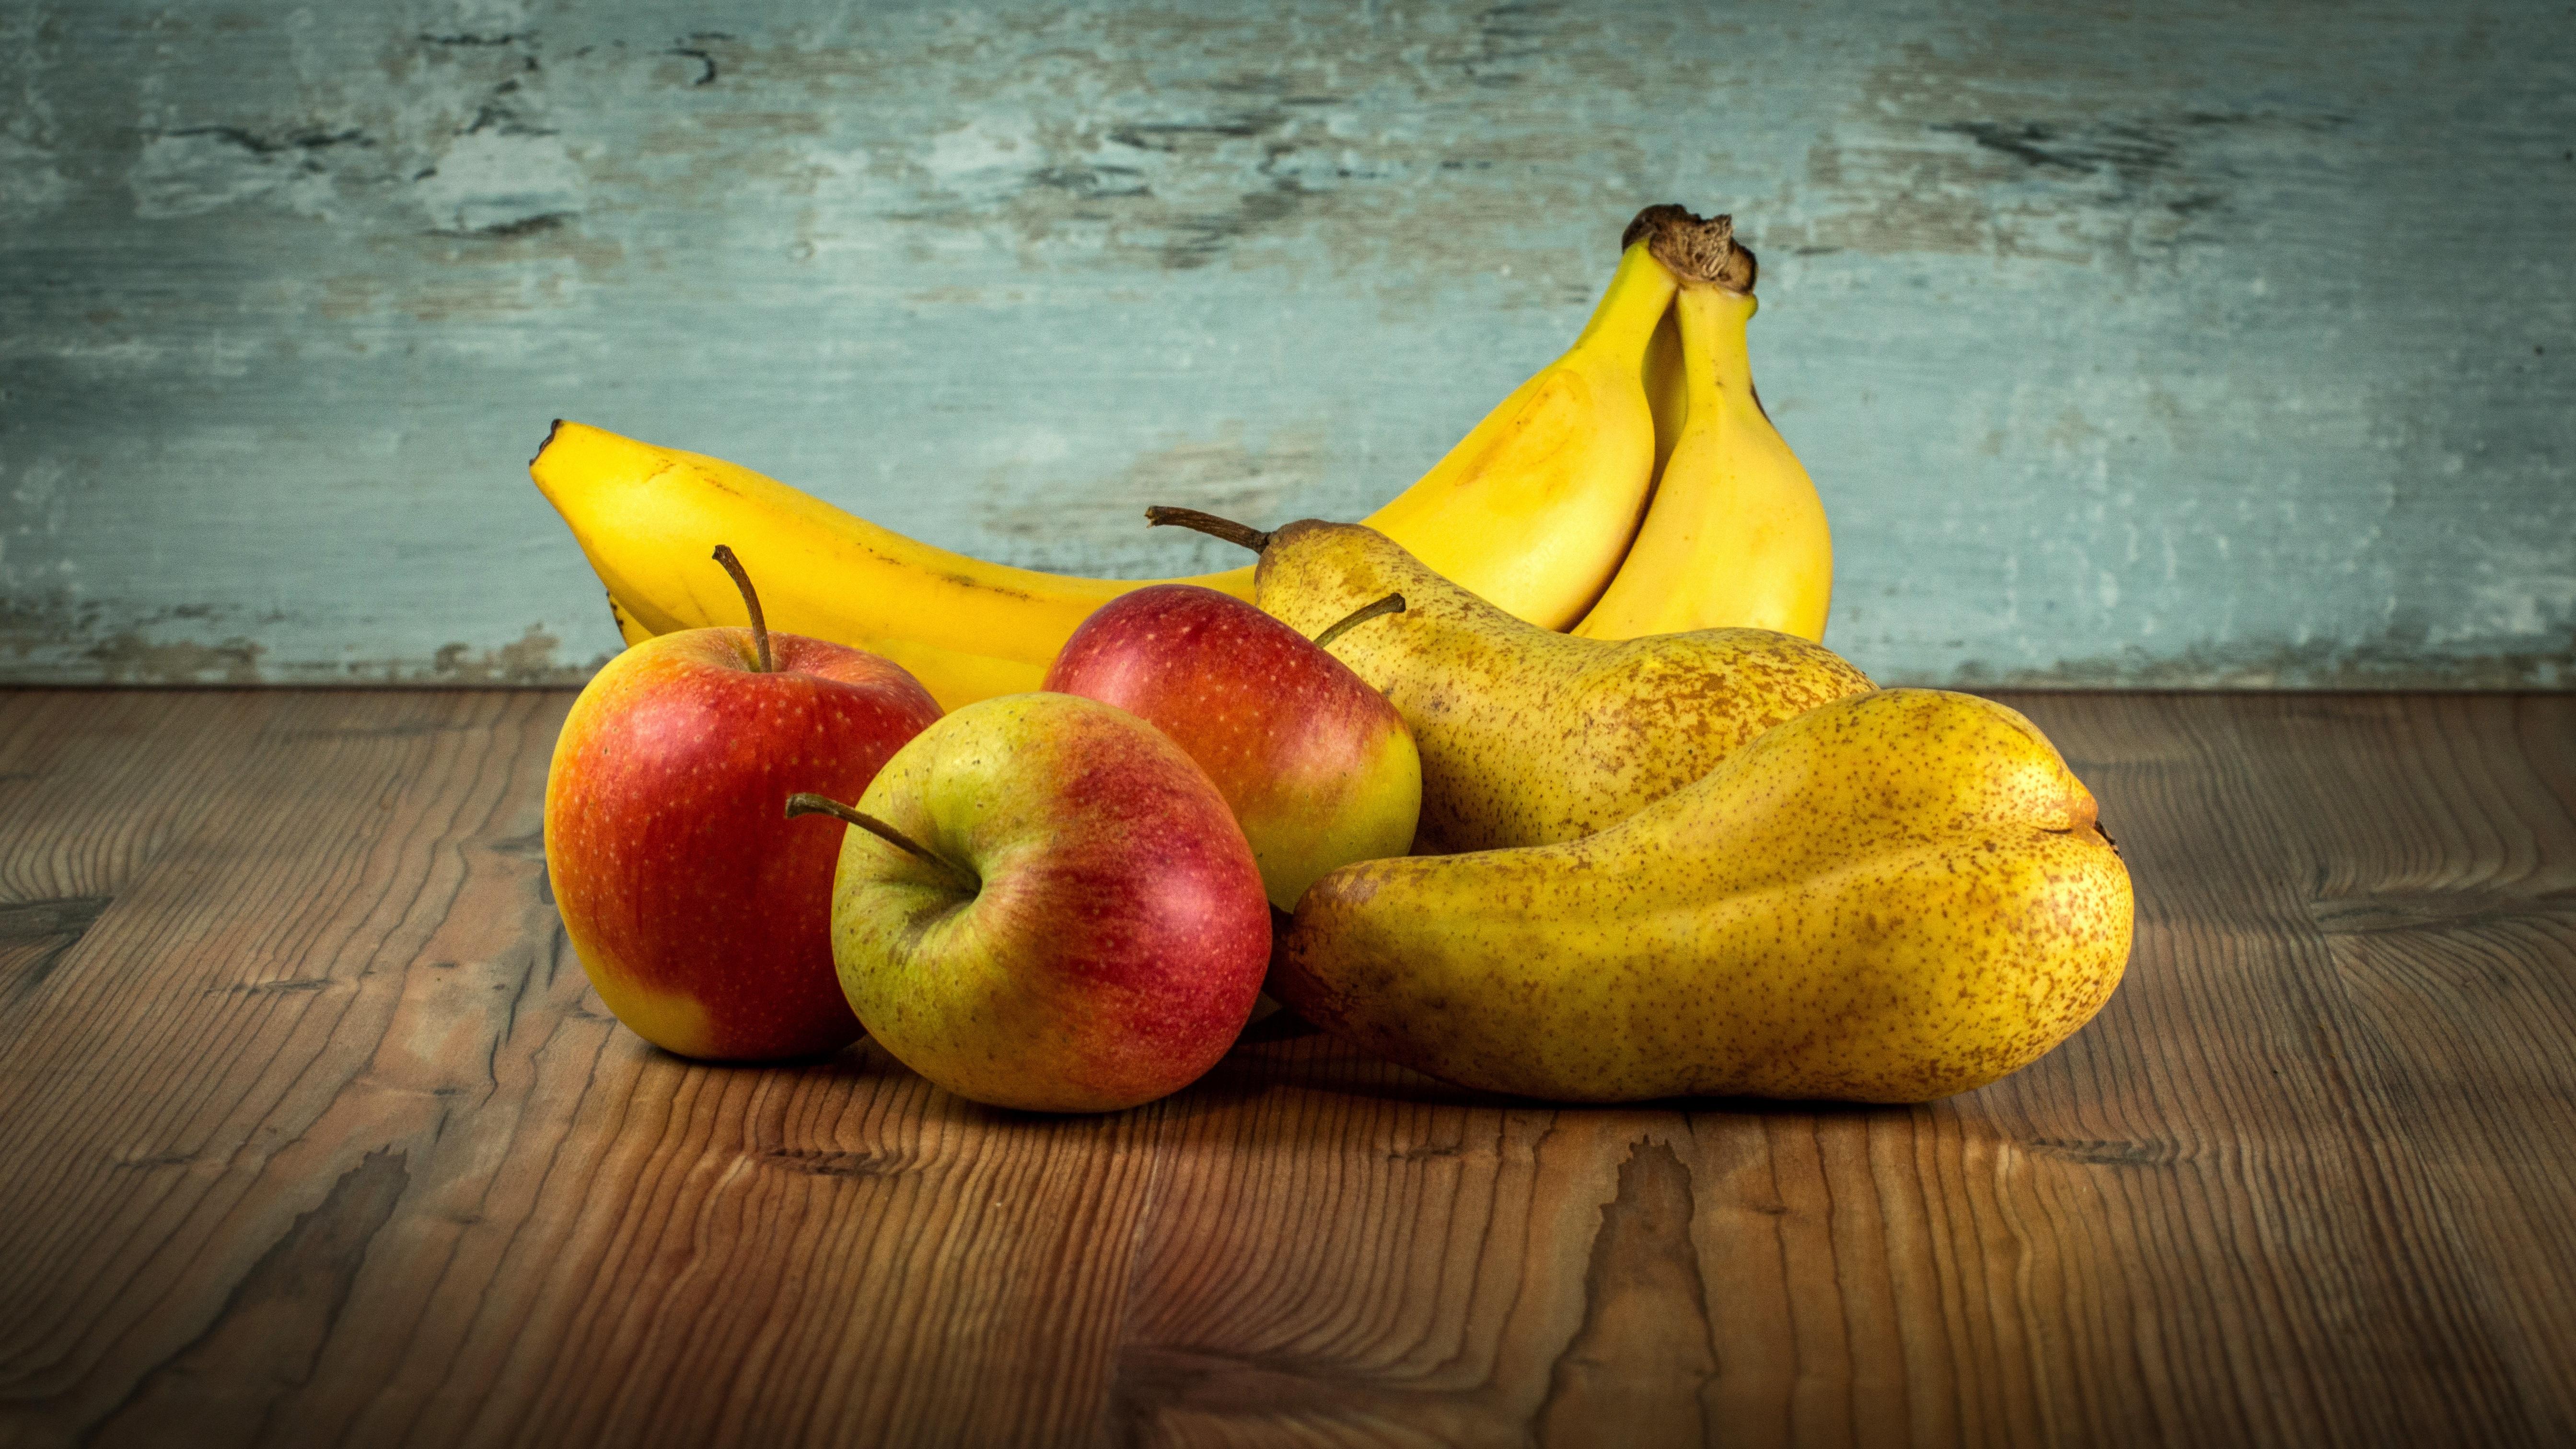 wallpaper : painting, food, fruit, yellow, apples, bananas, pears